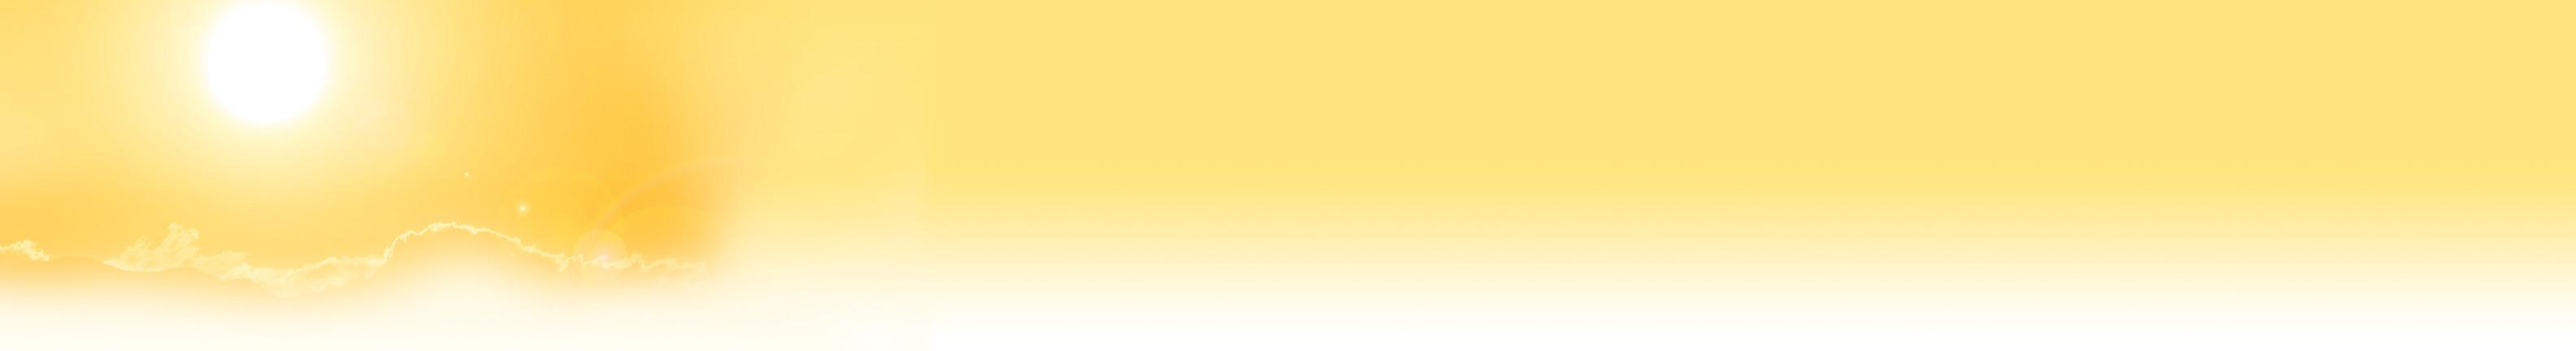 header-sonne-gelb1.jpg